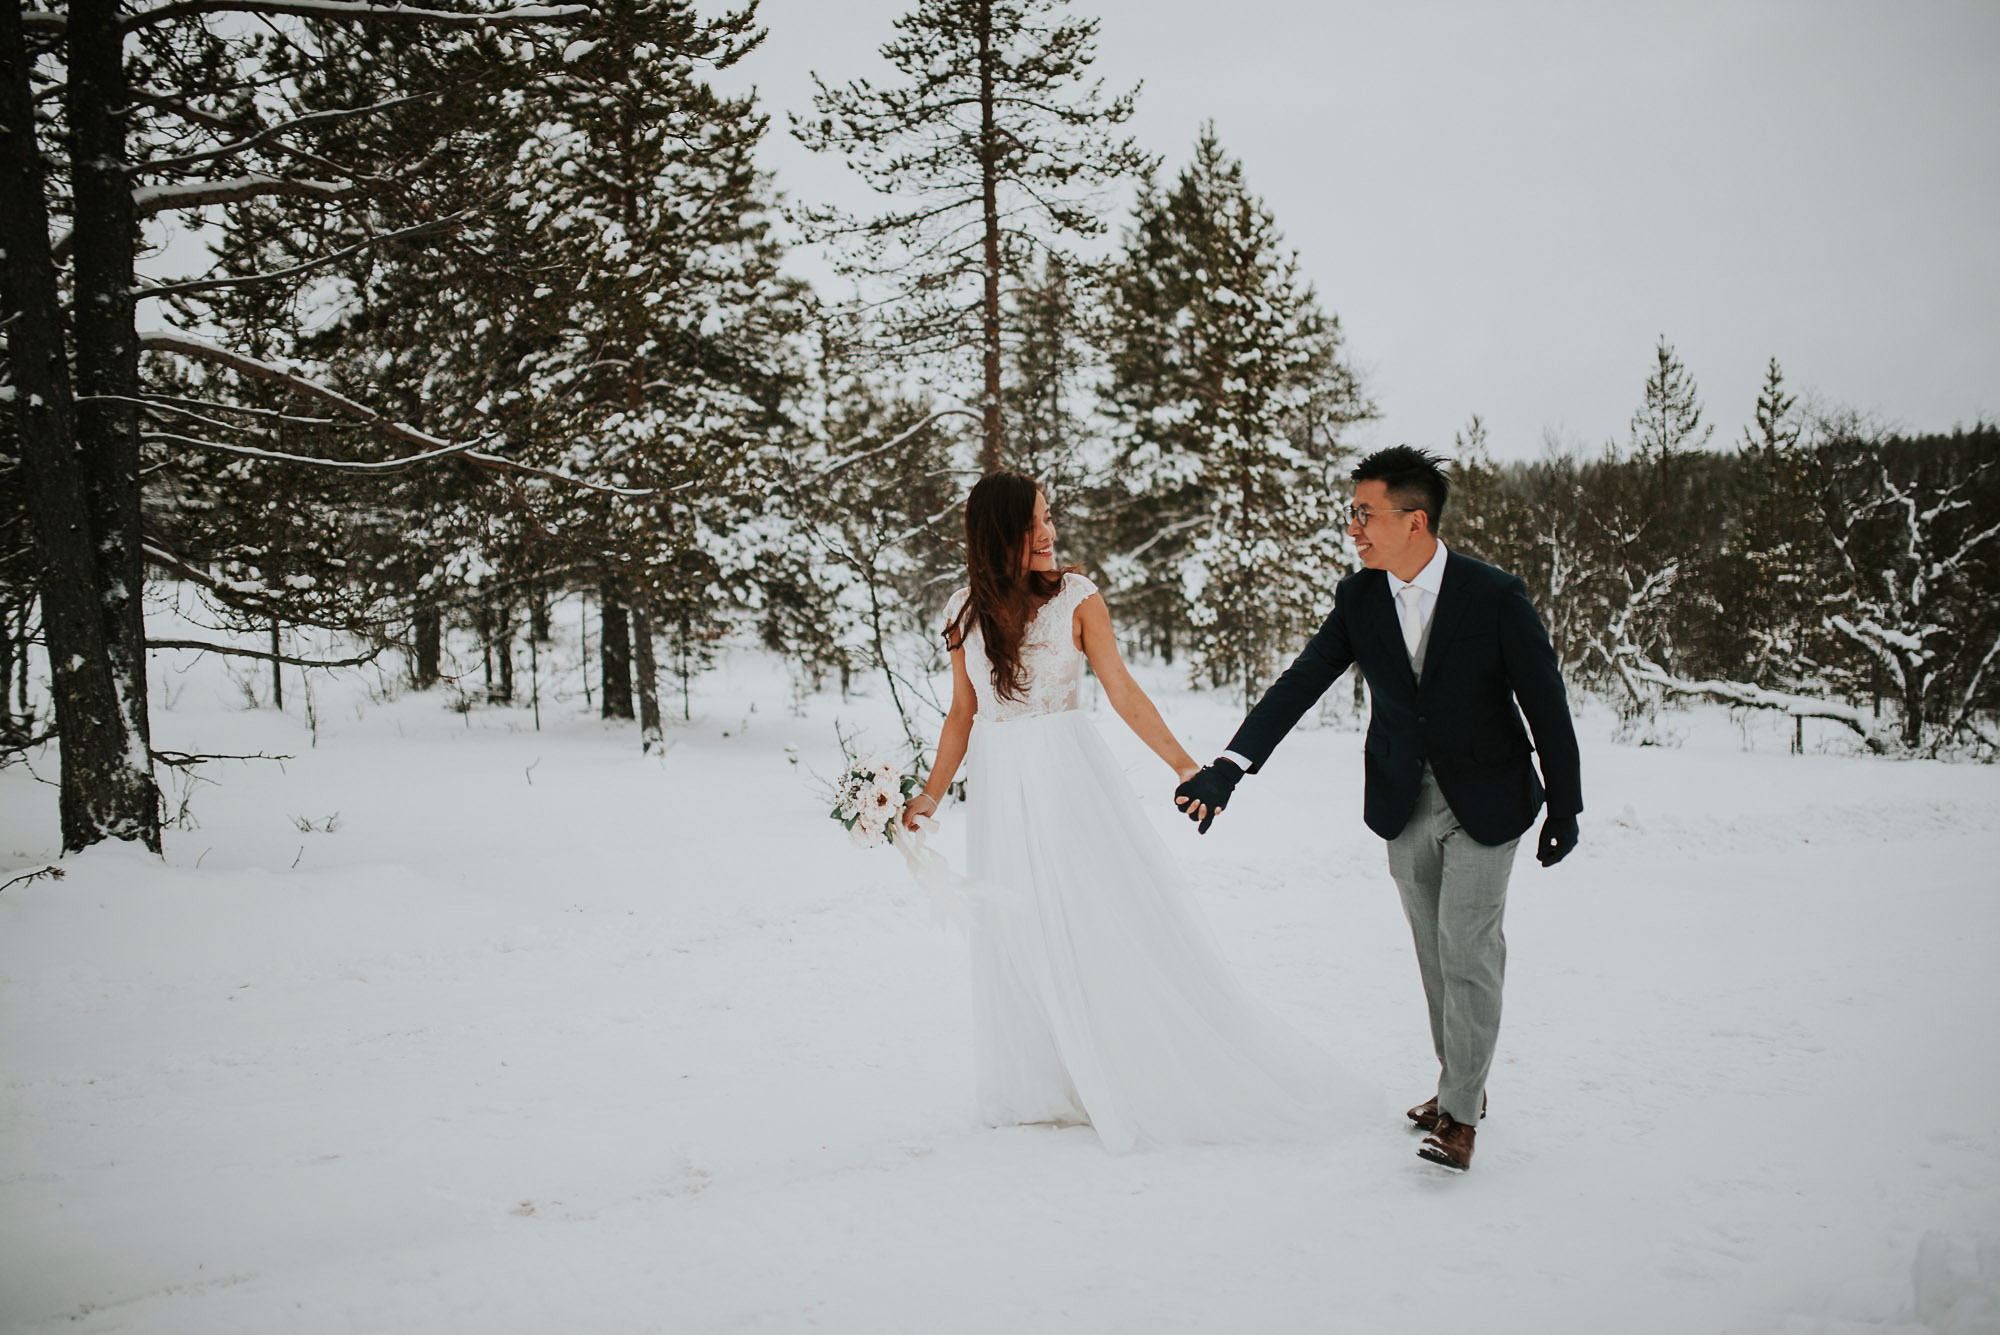 levi-ice-chapel-weddings-lapland-finland-photographer-jere-satamo-030-blog.jpg